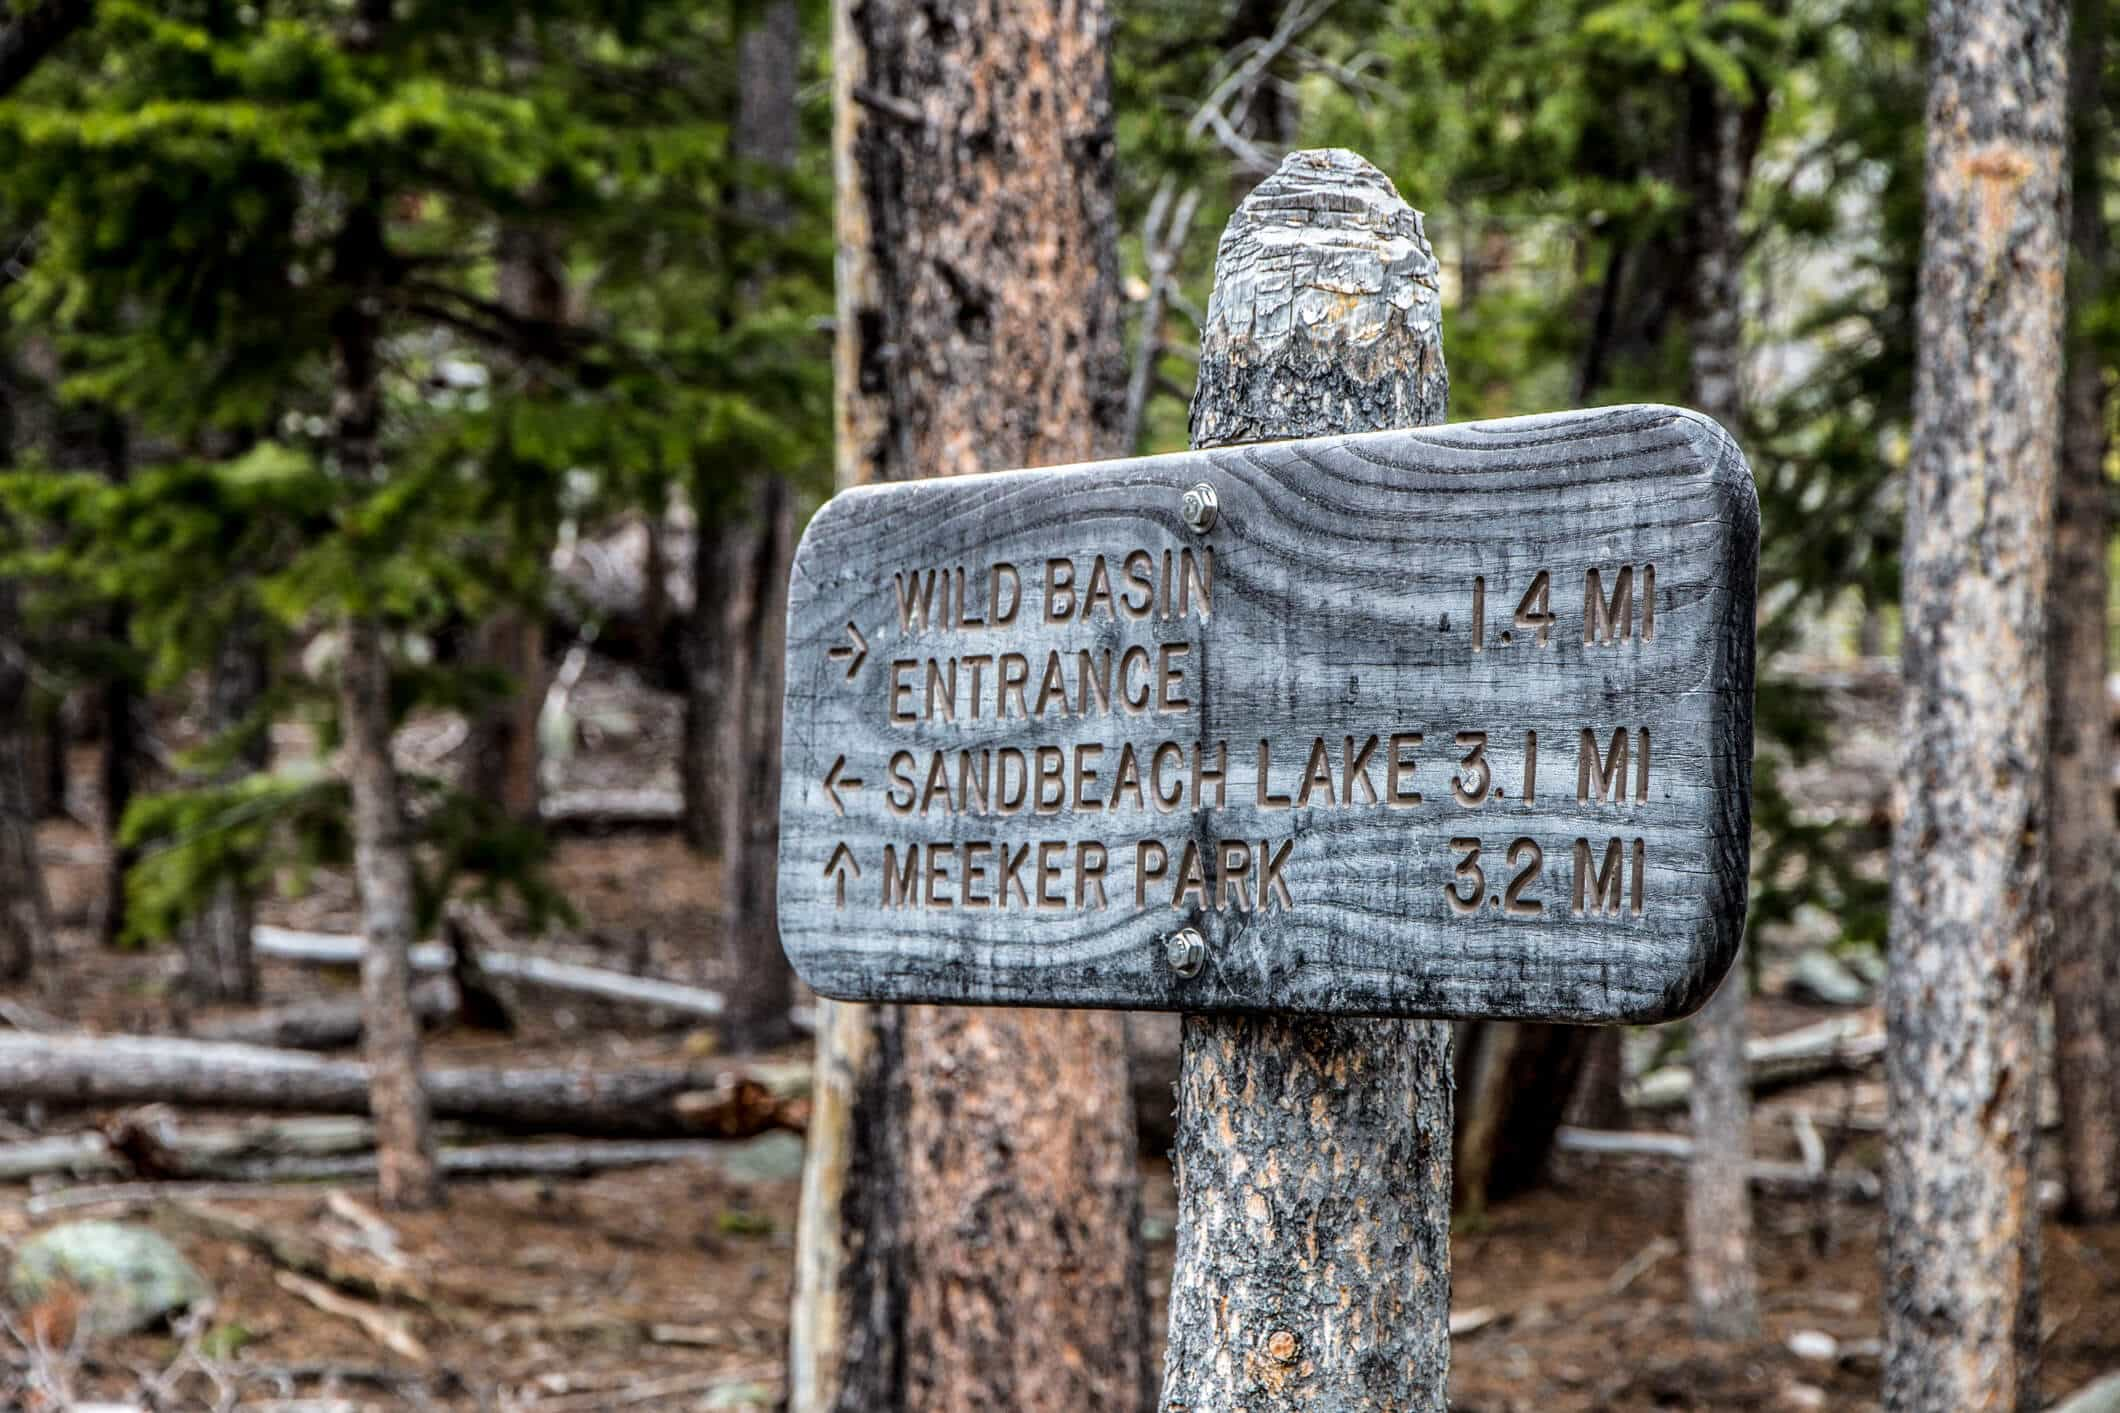 Trail Marker on Sandbeach Lake Trail